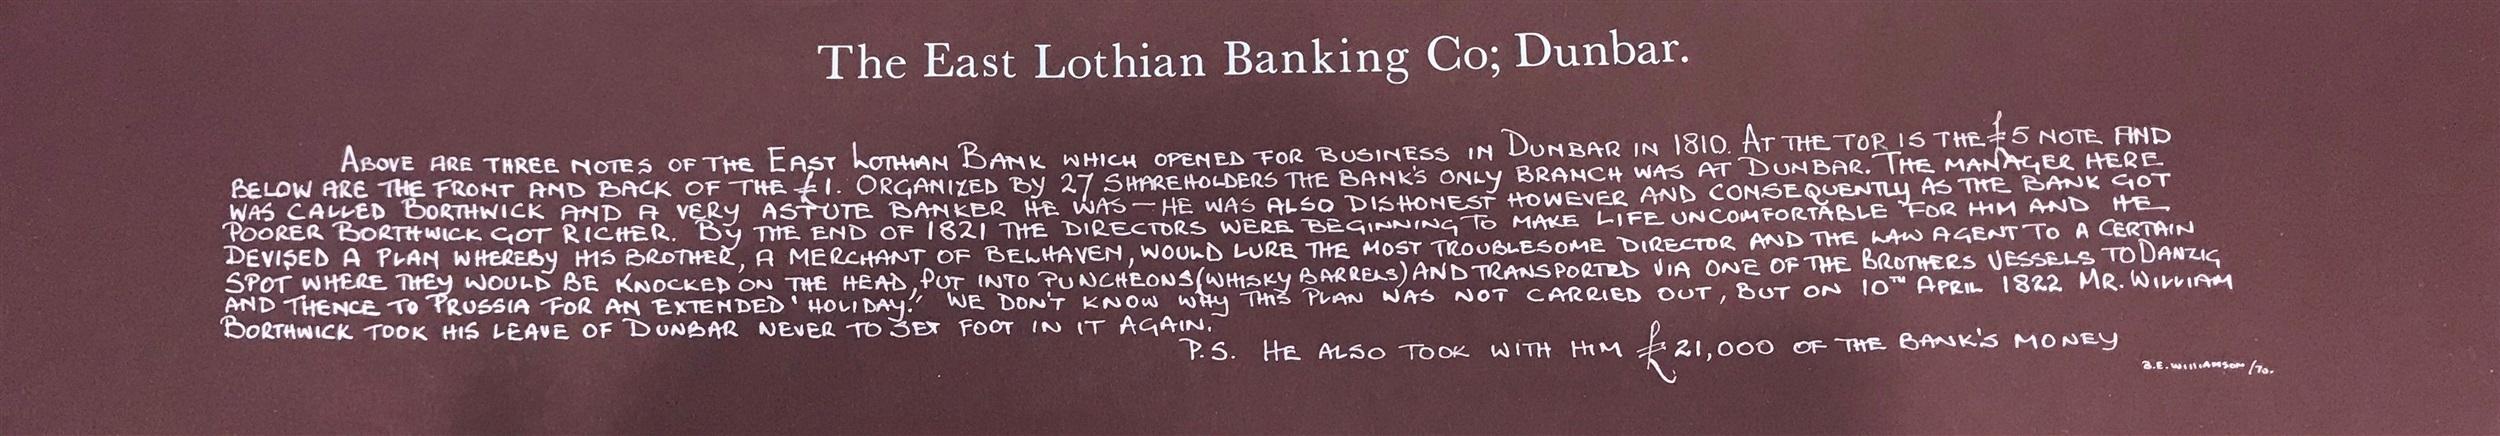 Lot 598 - AN EAST LOTHIAN BANKING COMPANY TWENTY SHILLINGS NOTED, UNDATED